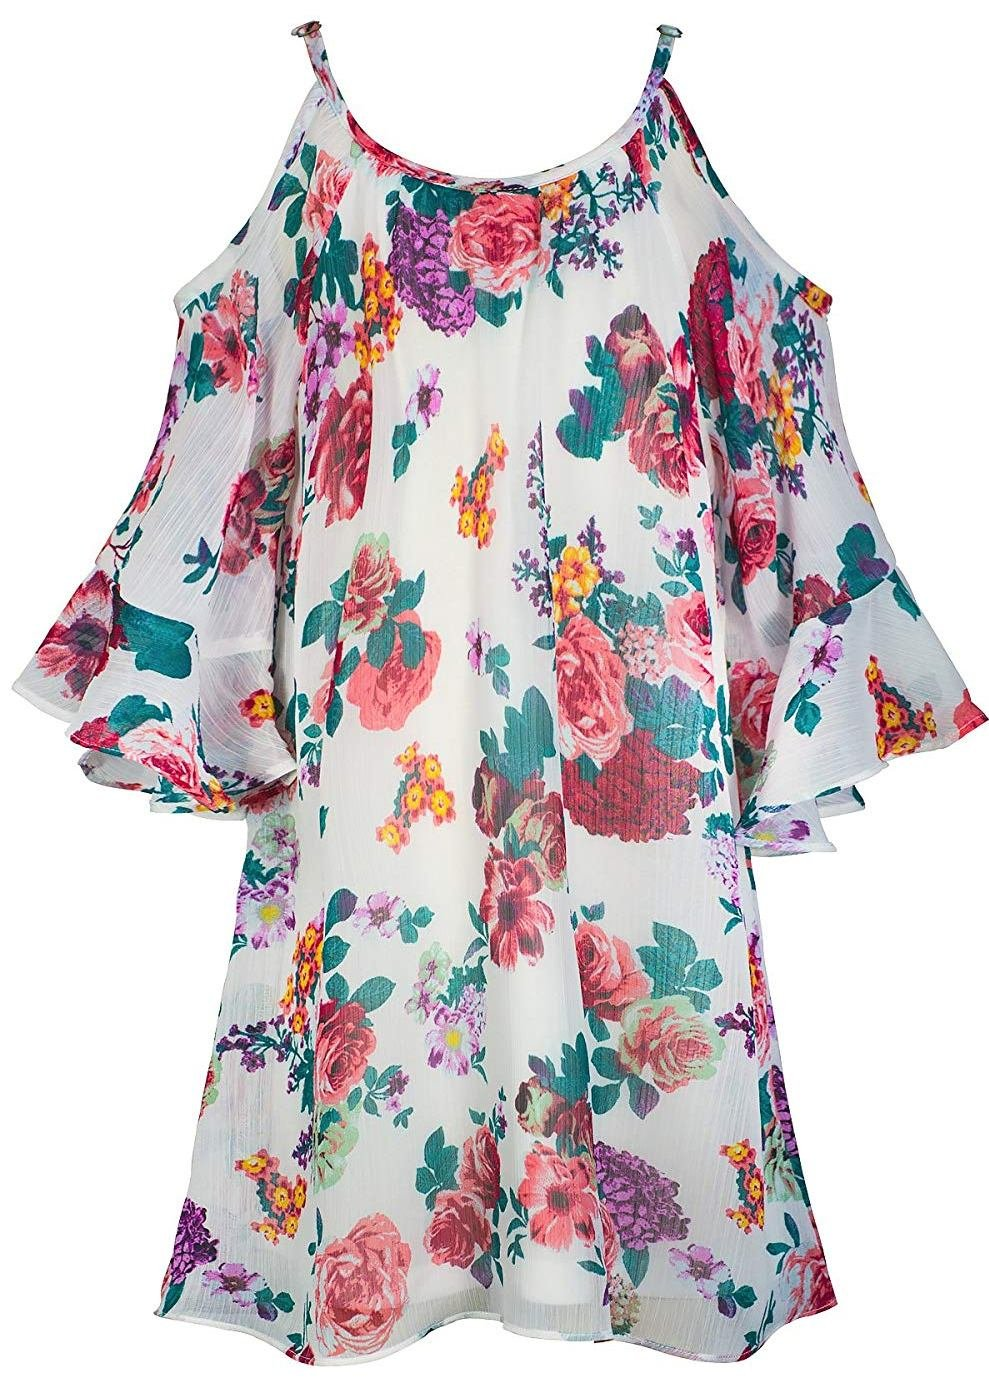 Truly Me, Big Girls Printed Summer Dresses (Many Options), 7-16 (Ivory Multi, 16)